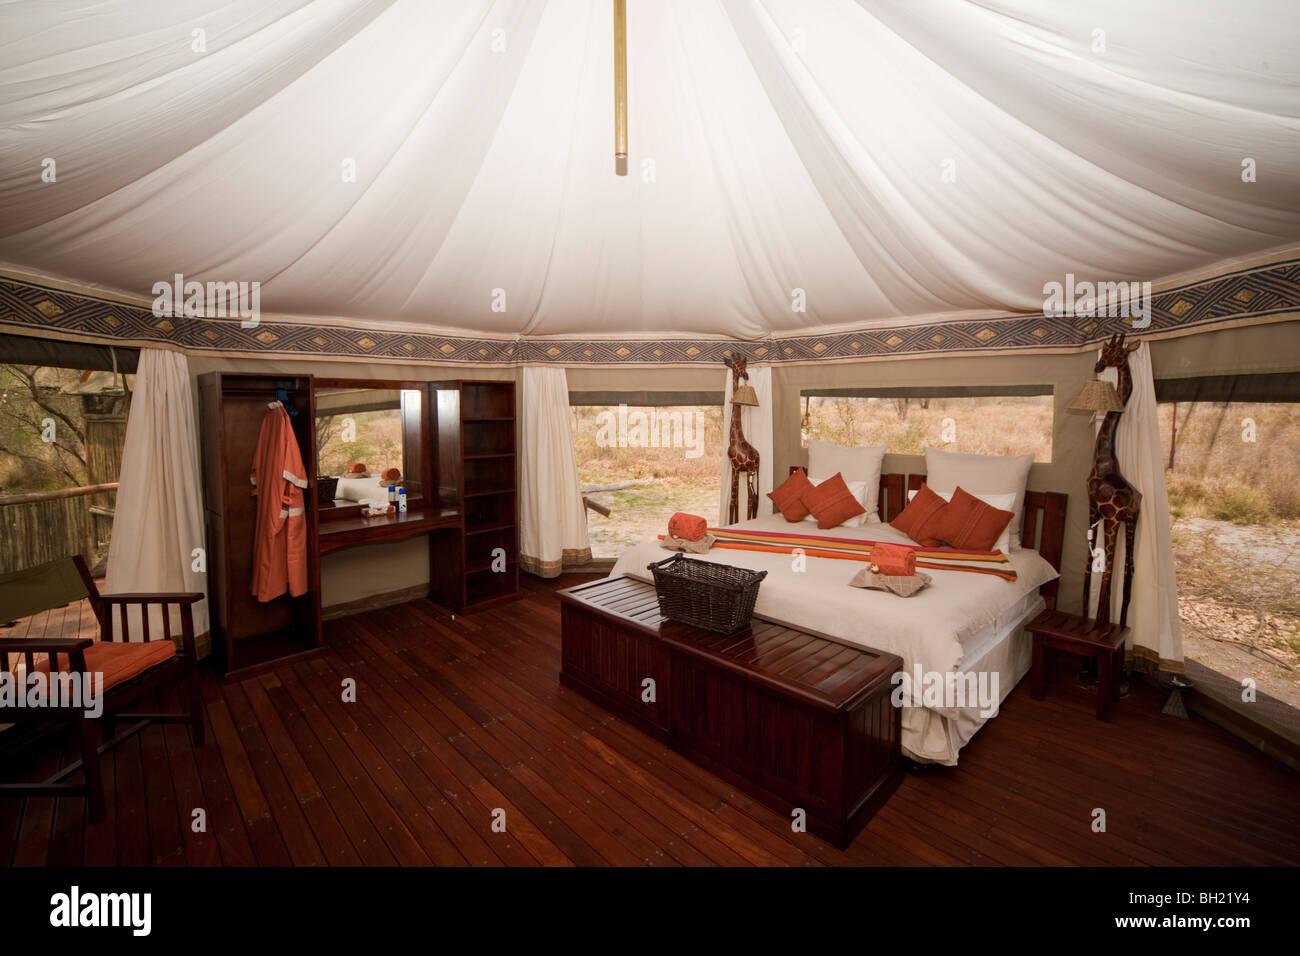 Interior of a luxury safari tent in Botswana. The photo was taken in Botswana's Chobe national park. - Stock Image